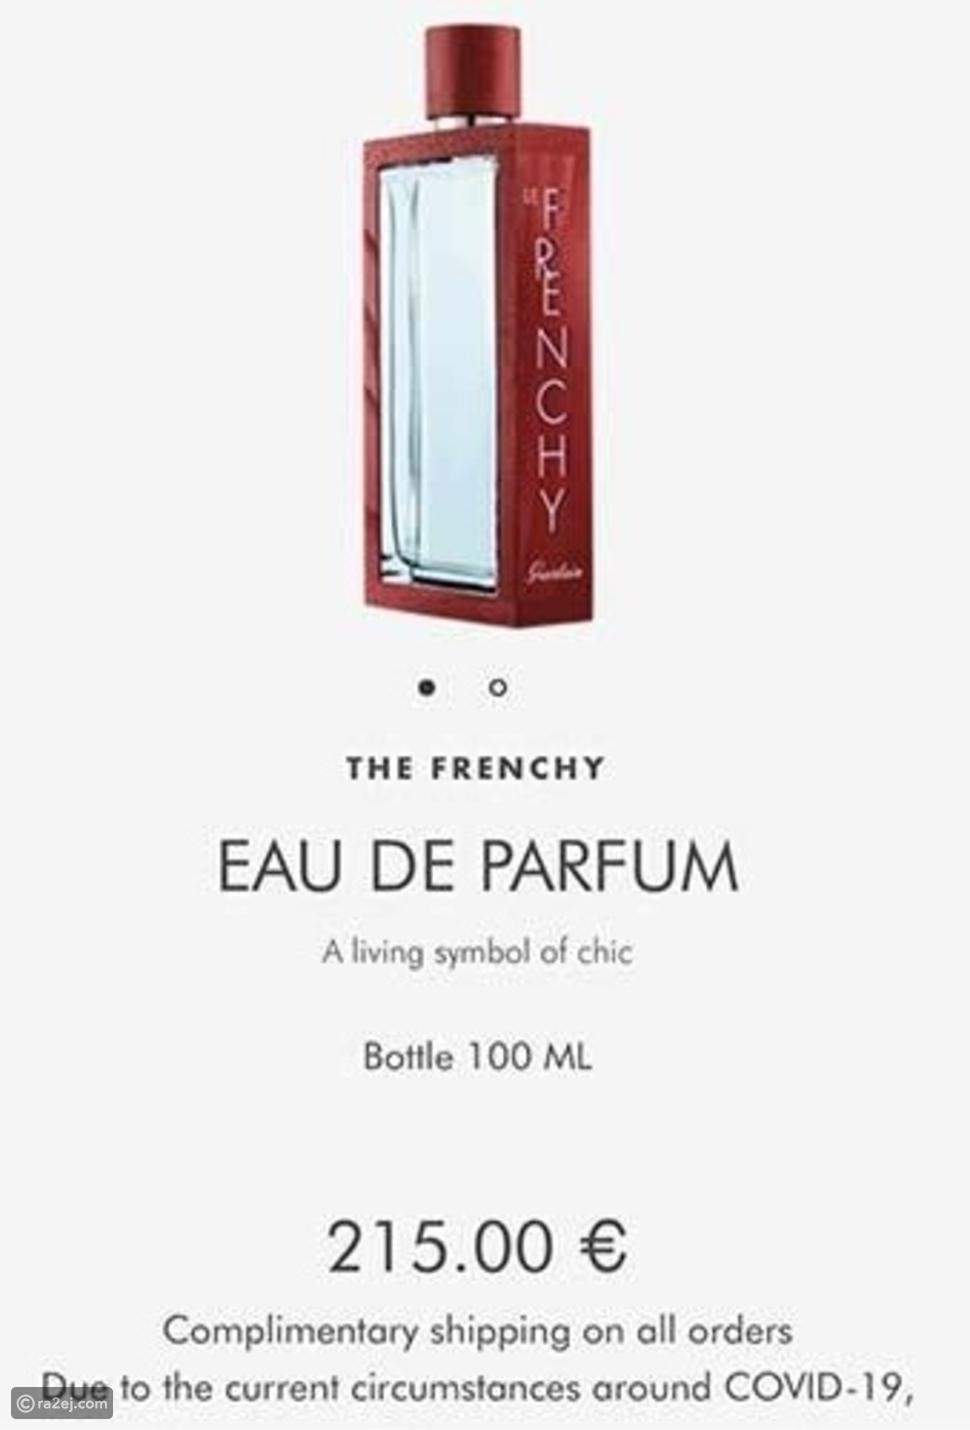 عطر الأمير محمد بن سلمان The Frenchy Eau De Parfum من Guerlain